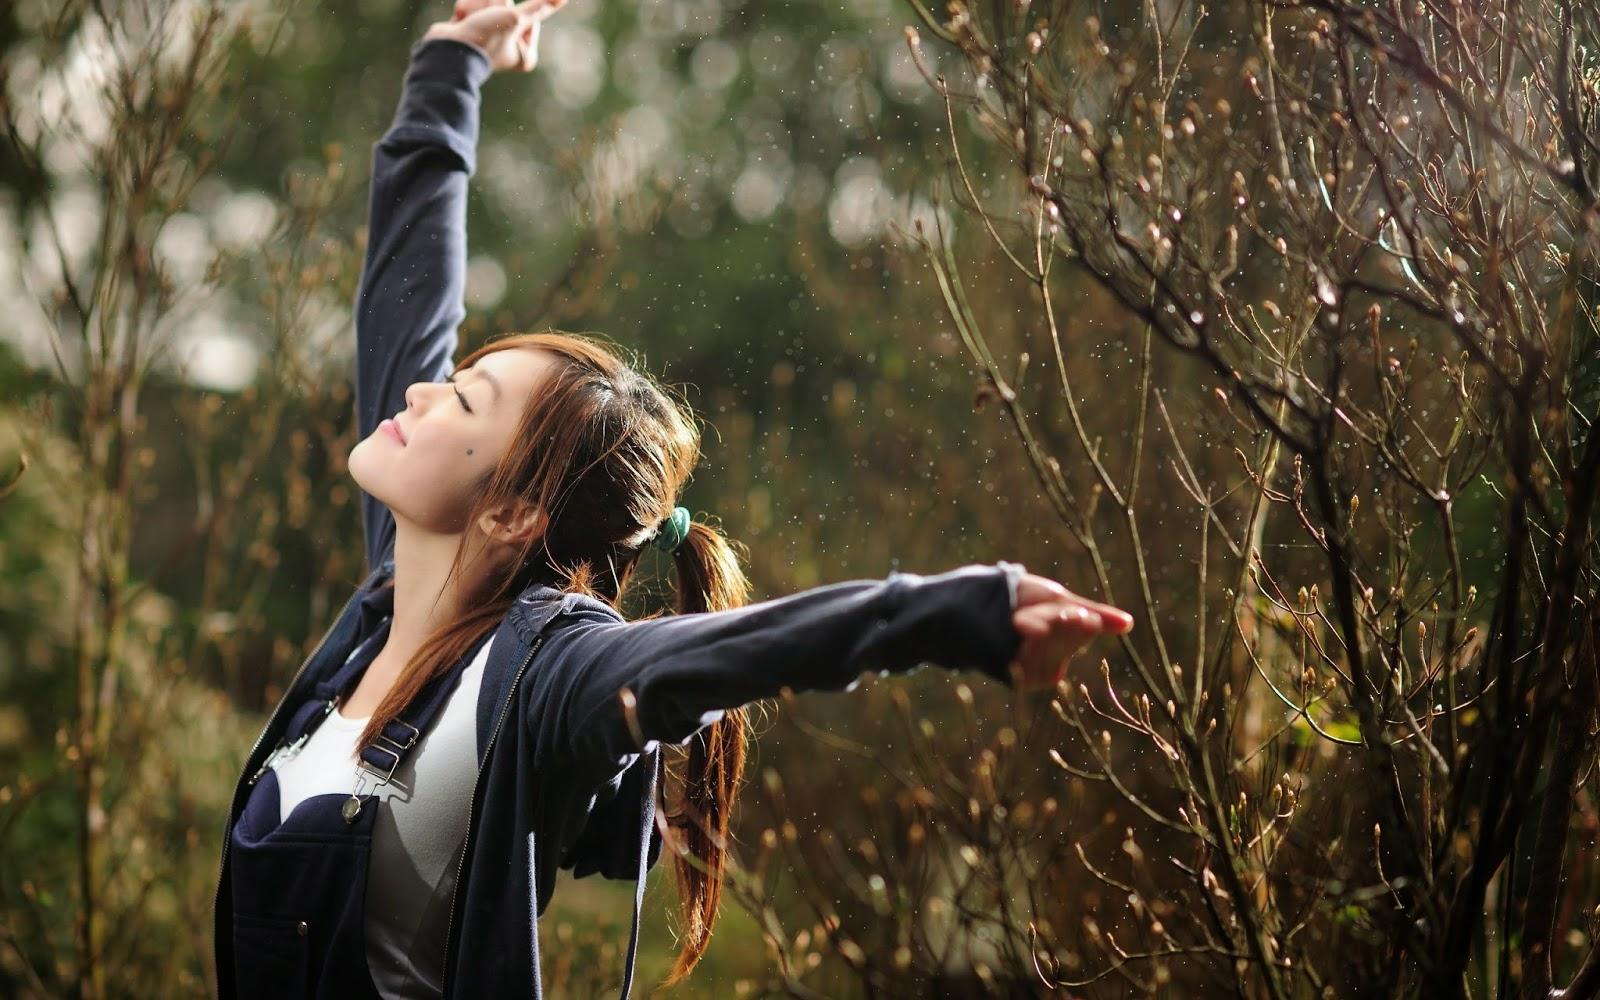 Happy Girl In The Rain Hd Wallpaper